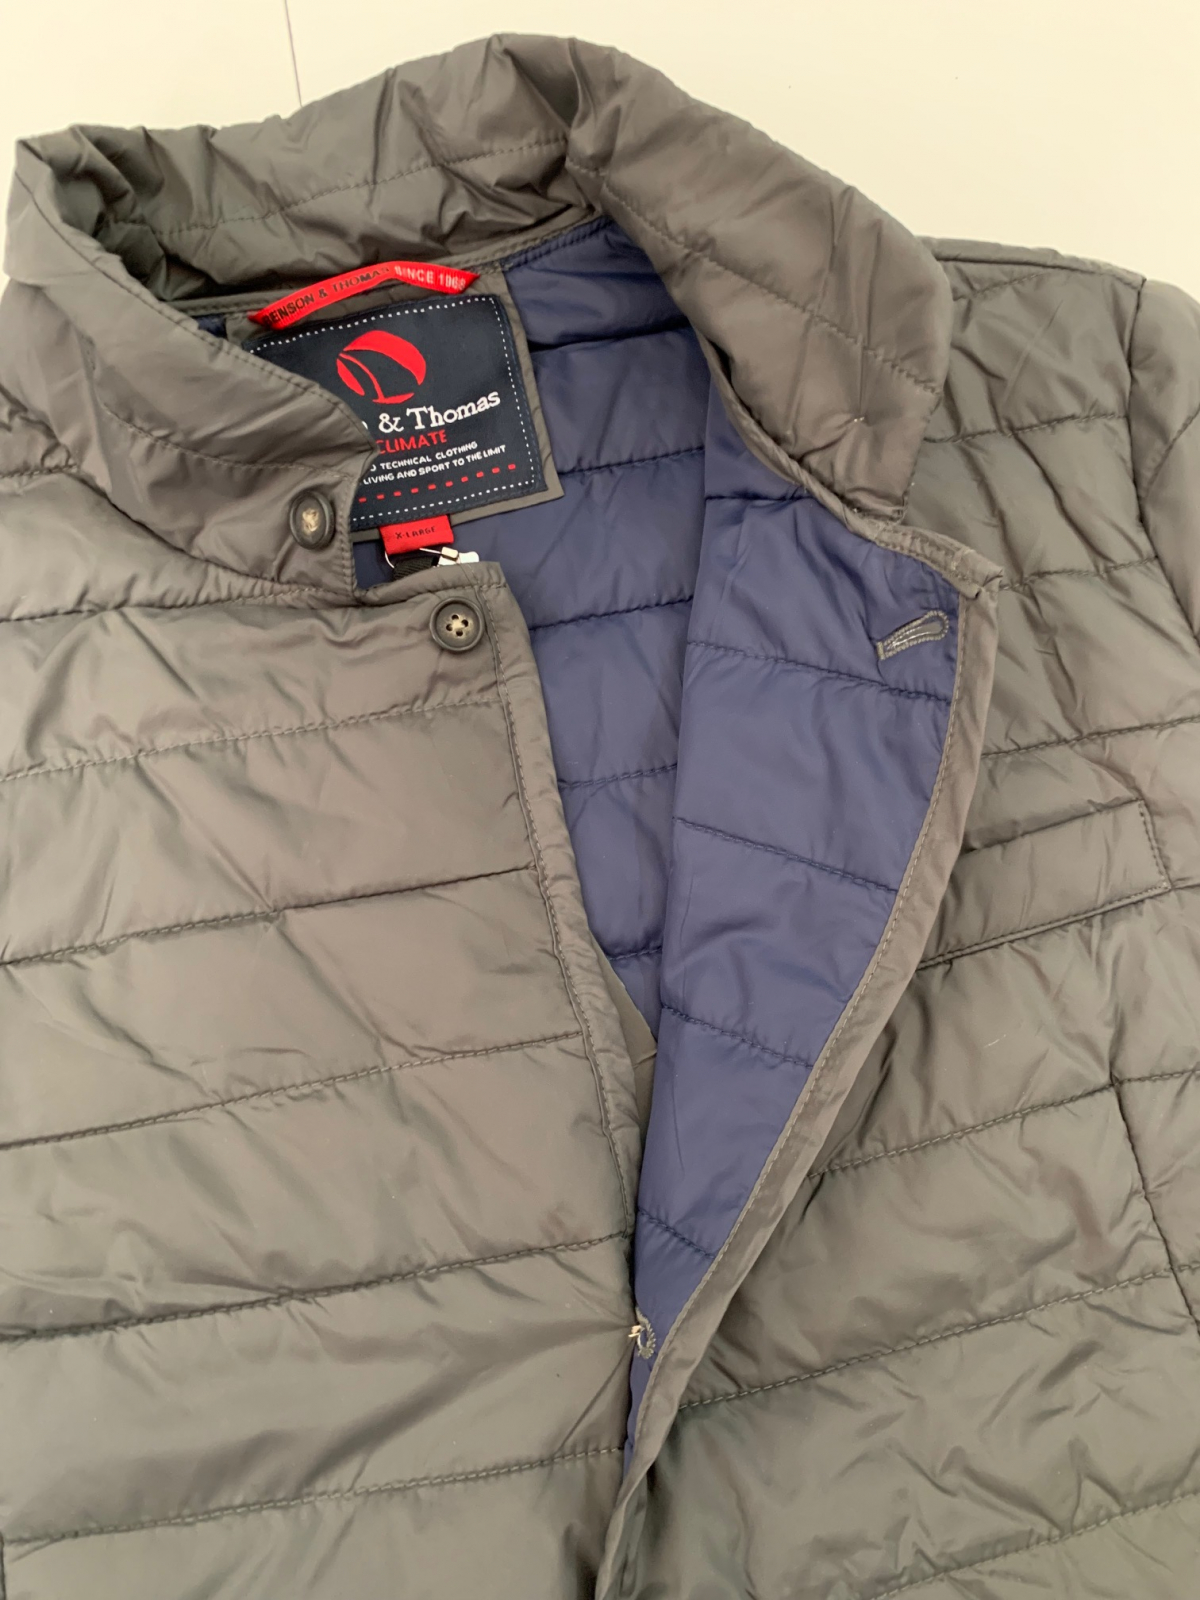 Серая мужская куртка о бренда Benson & Thomas